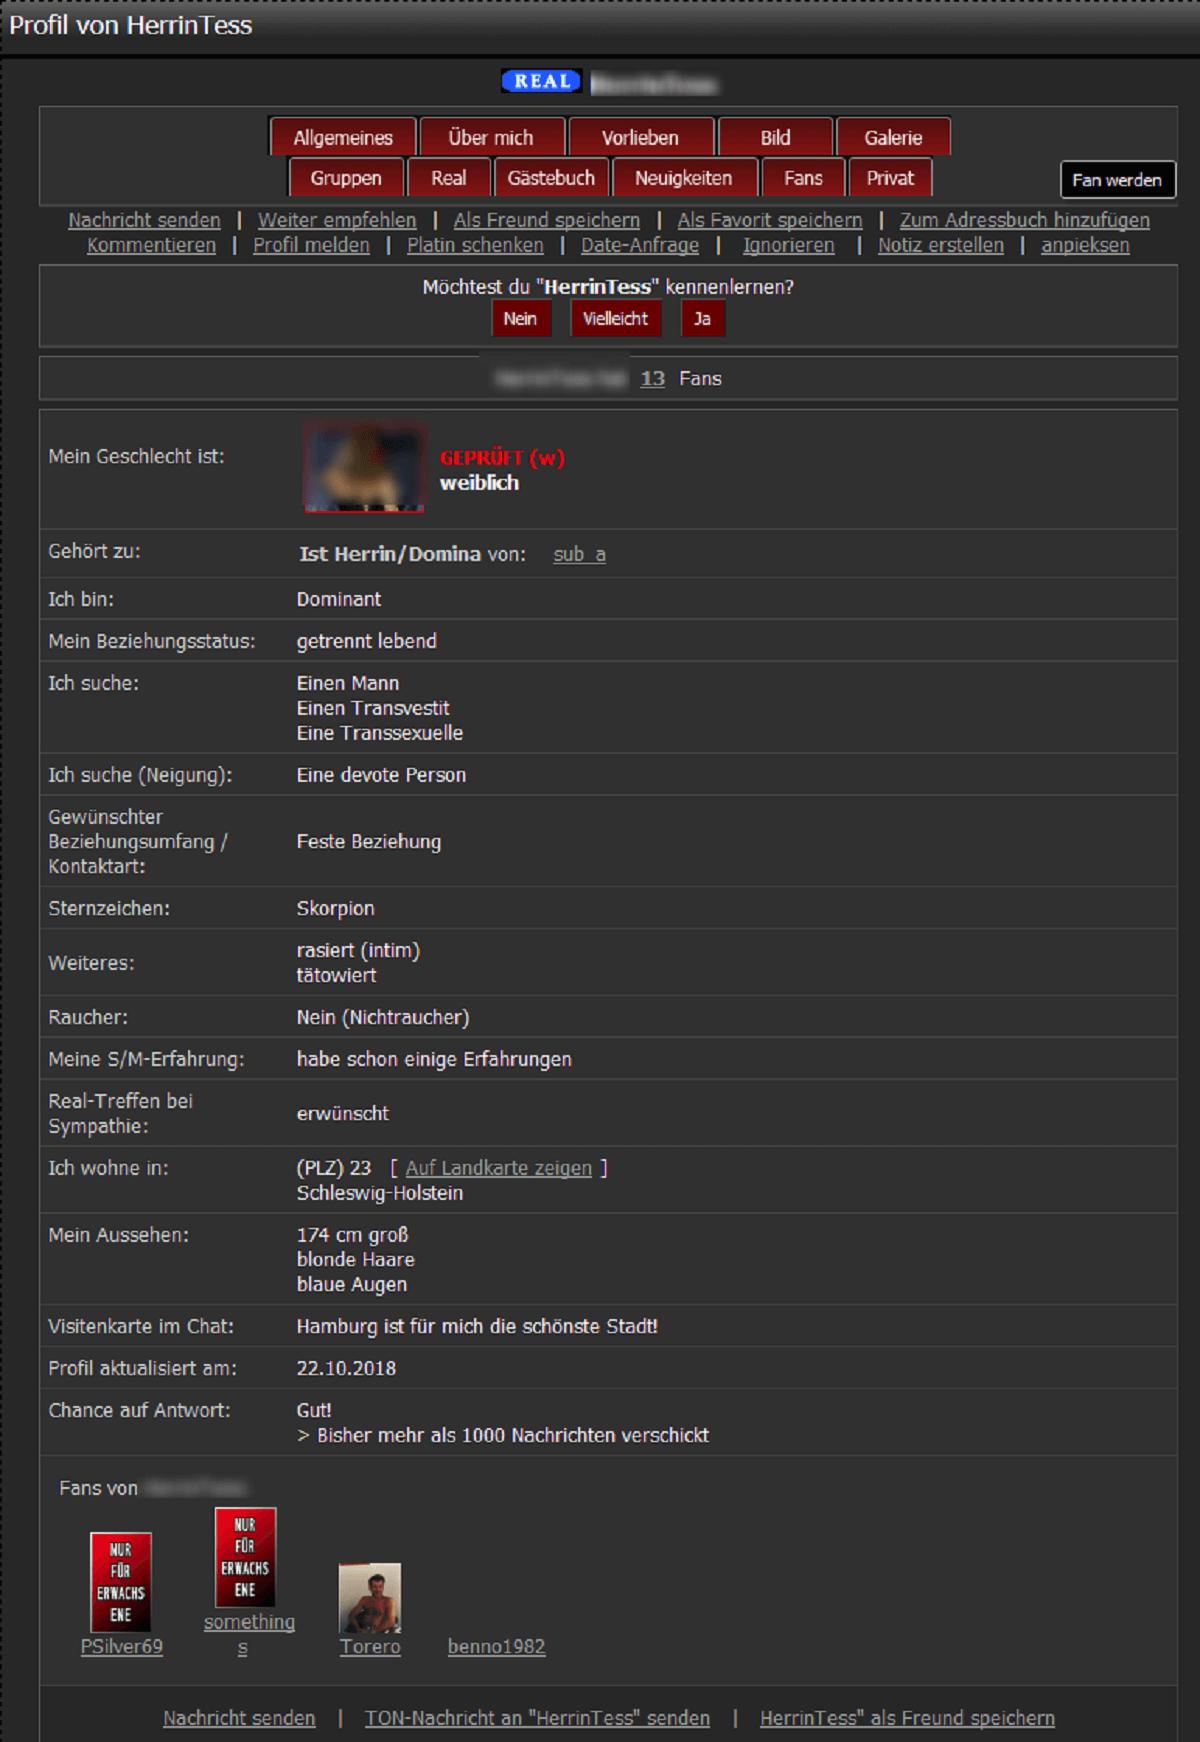 Sadomasochat Match Profile